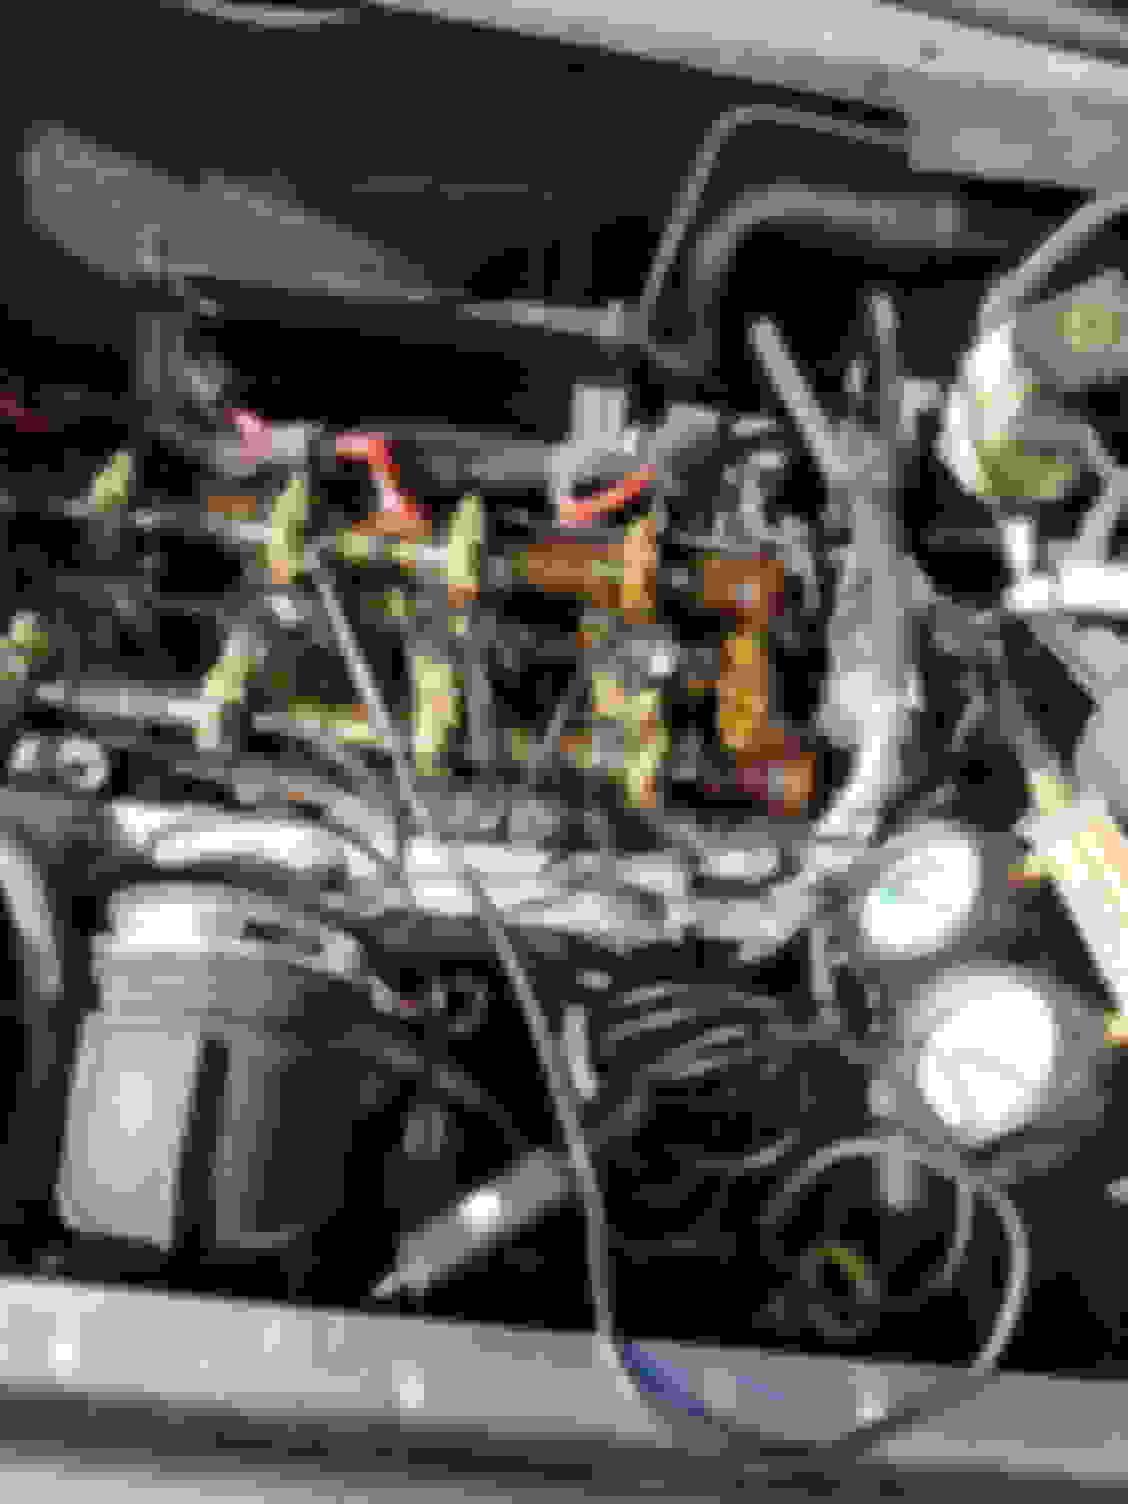 Single Cylinder Misfire - intake valve spring - Page 13 - Chevy HHR